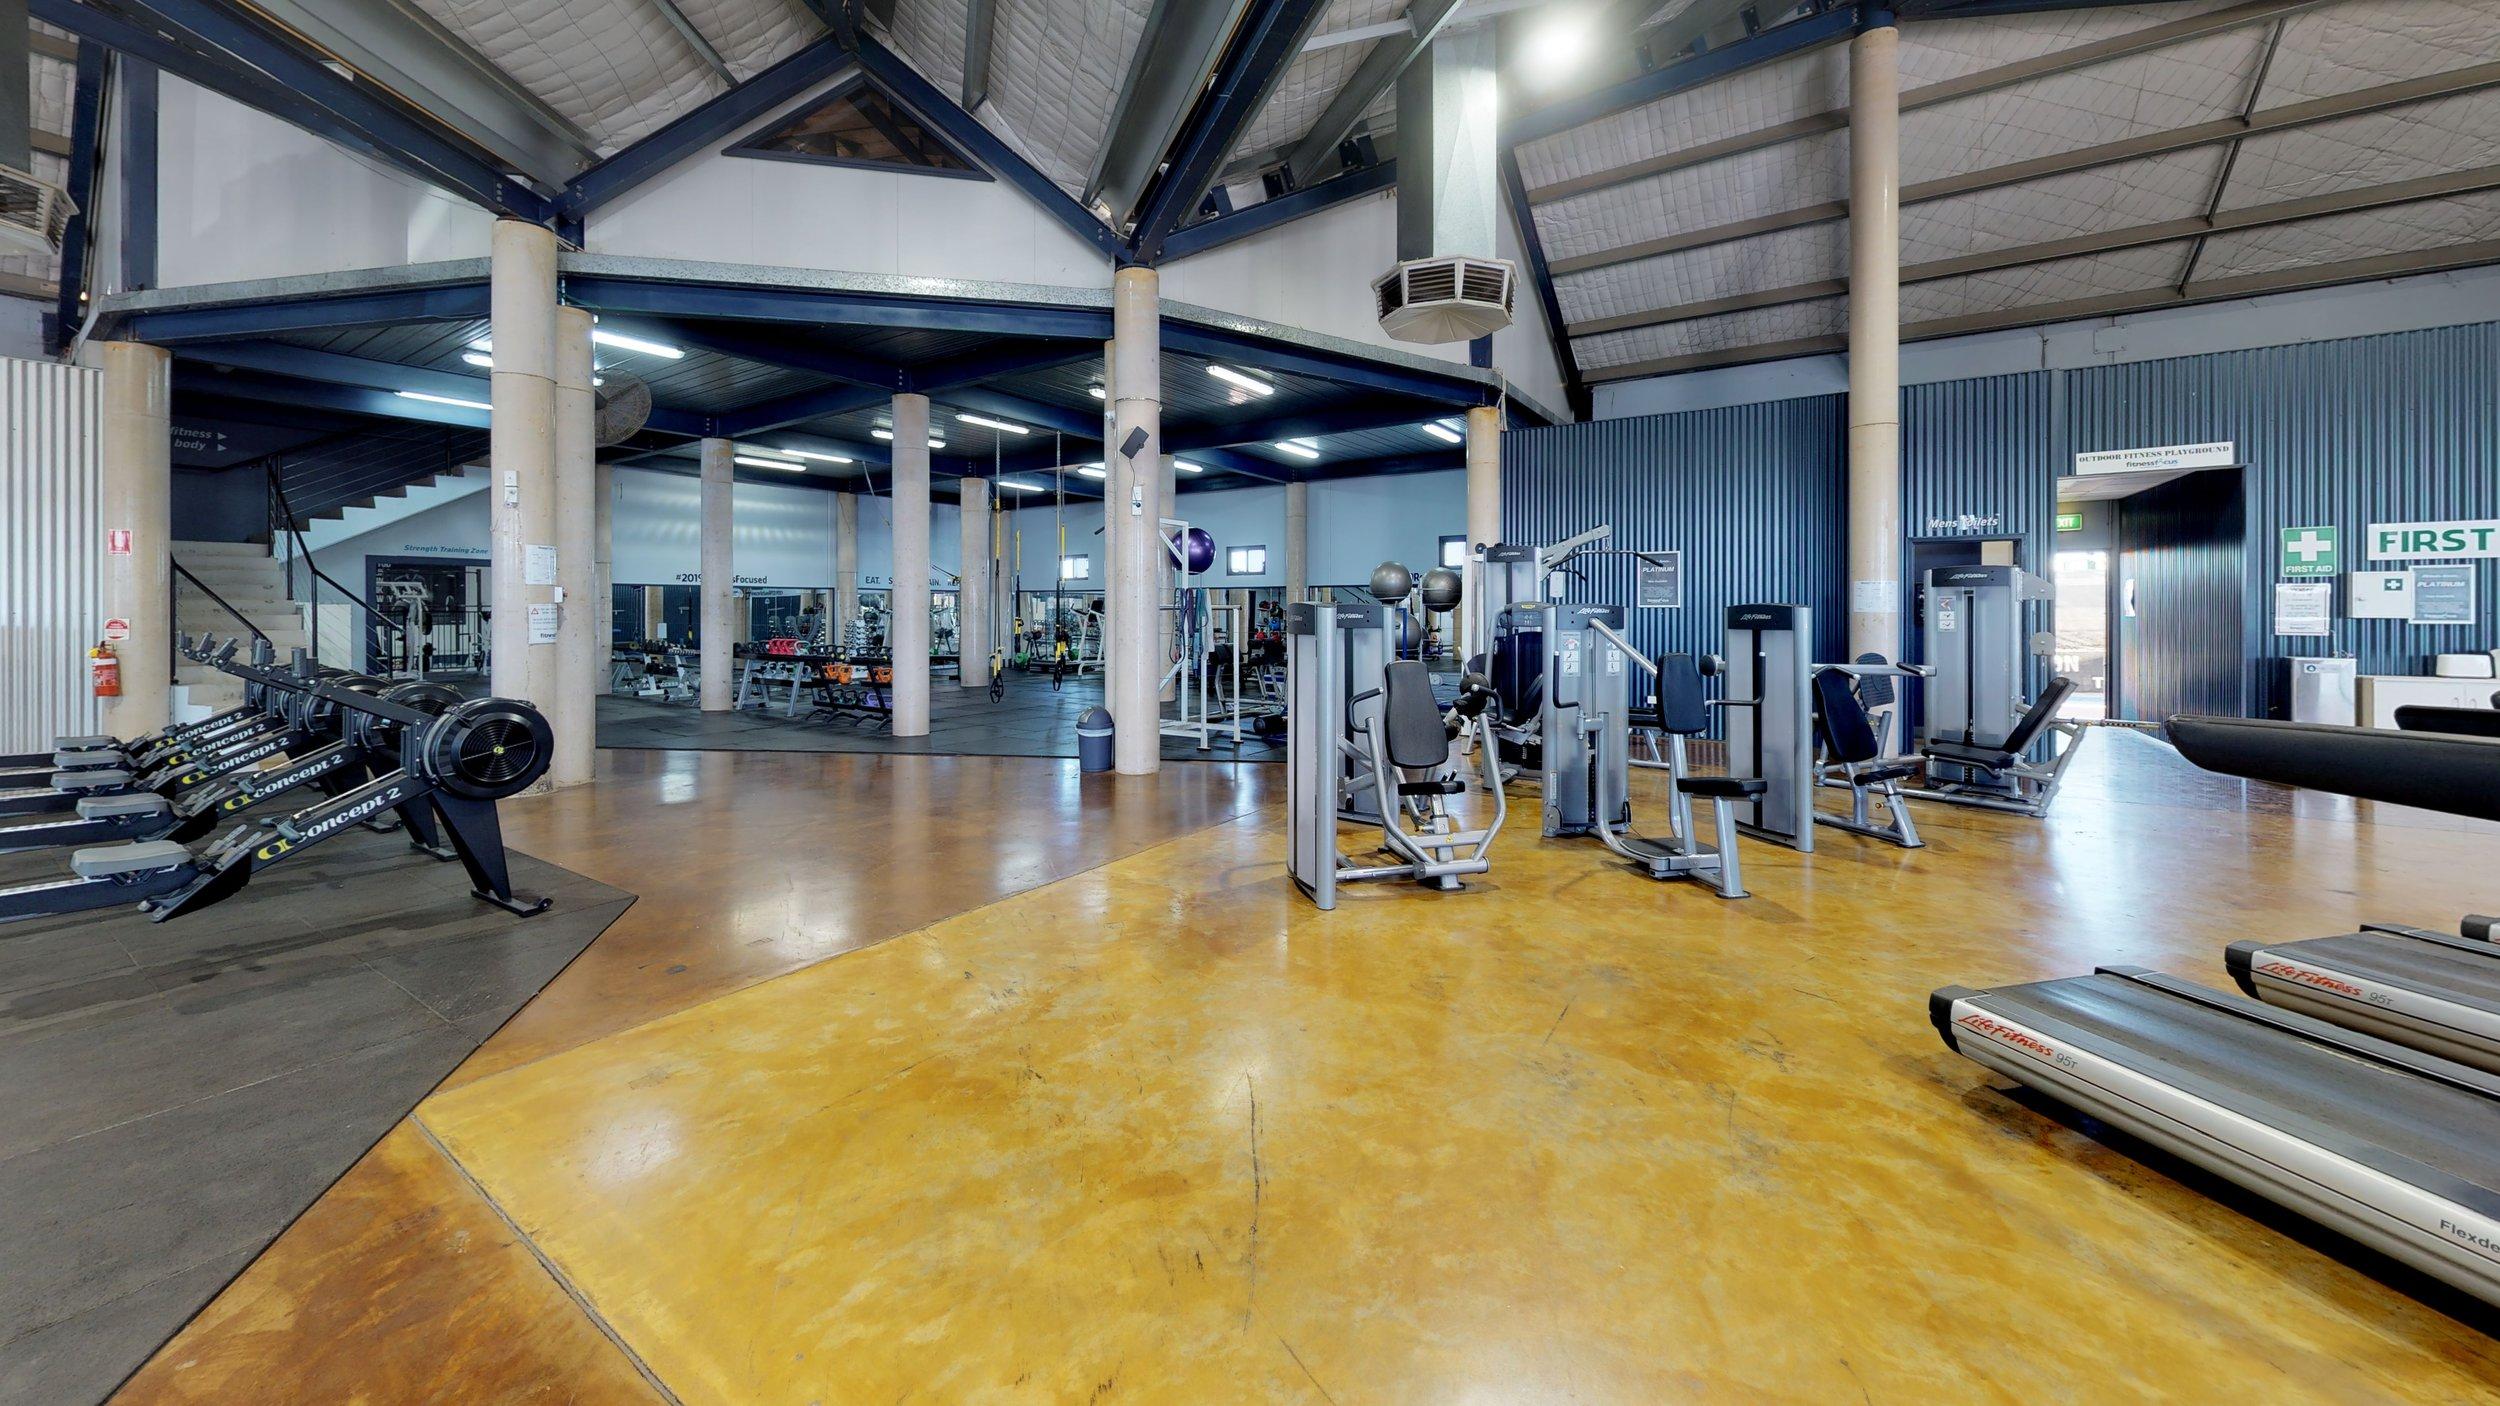 Fitness-Focus-Garage (2) (1).jpg